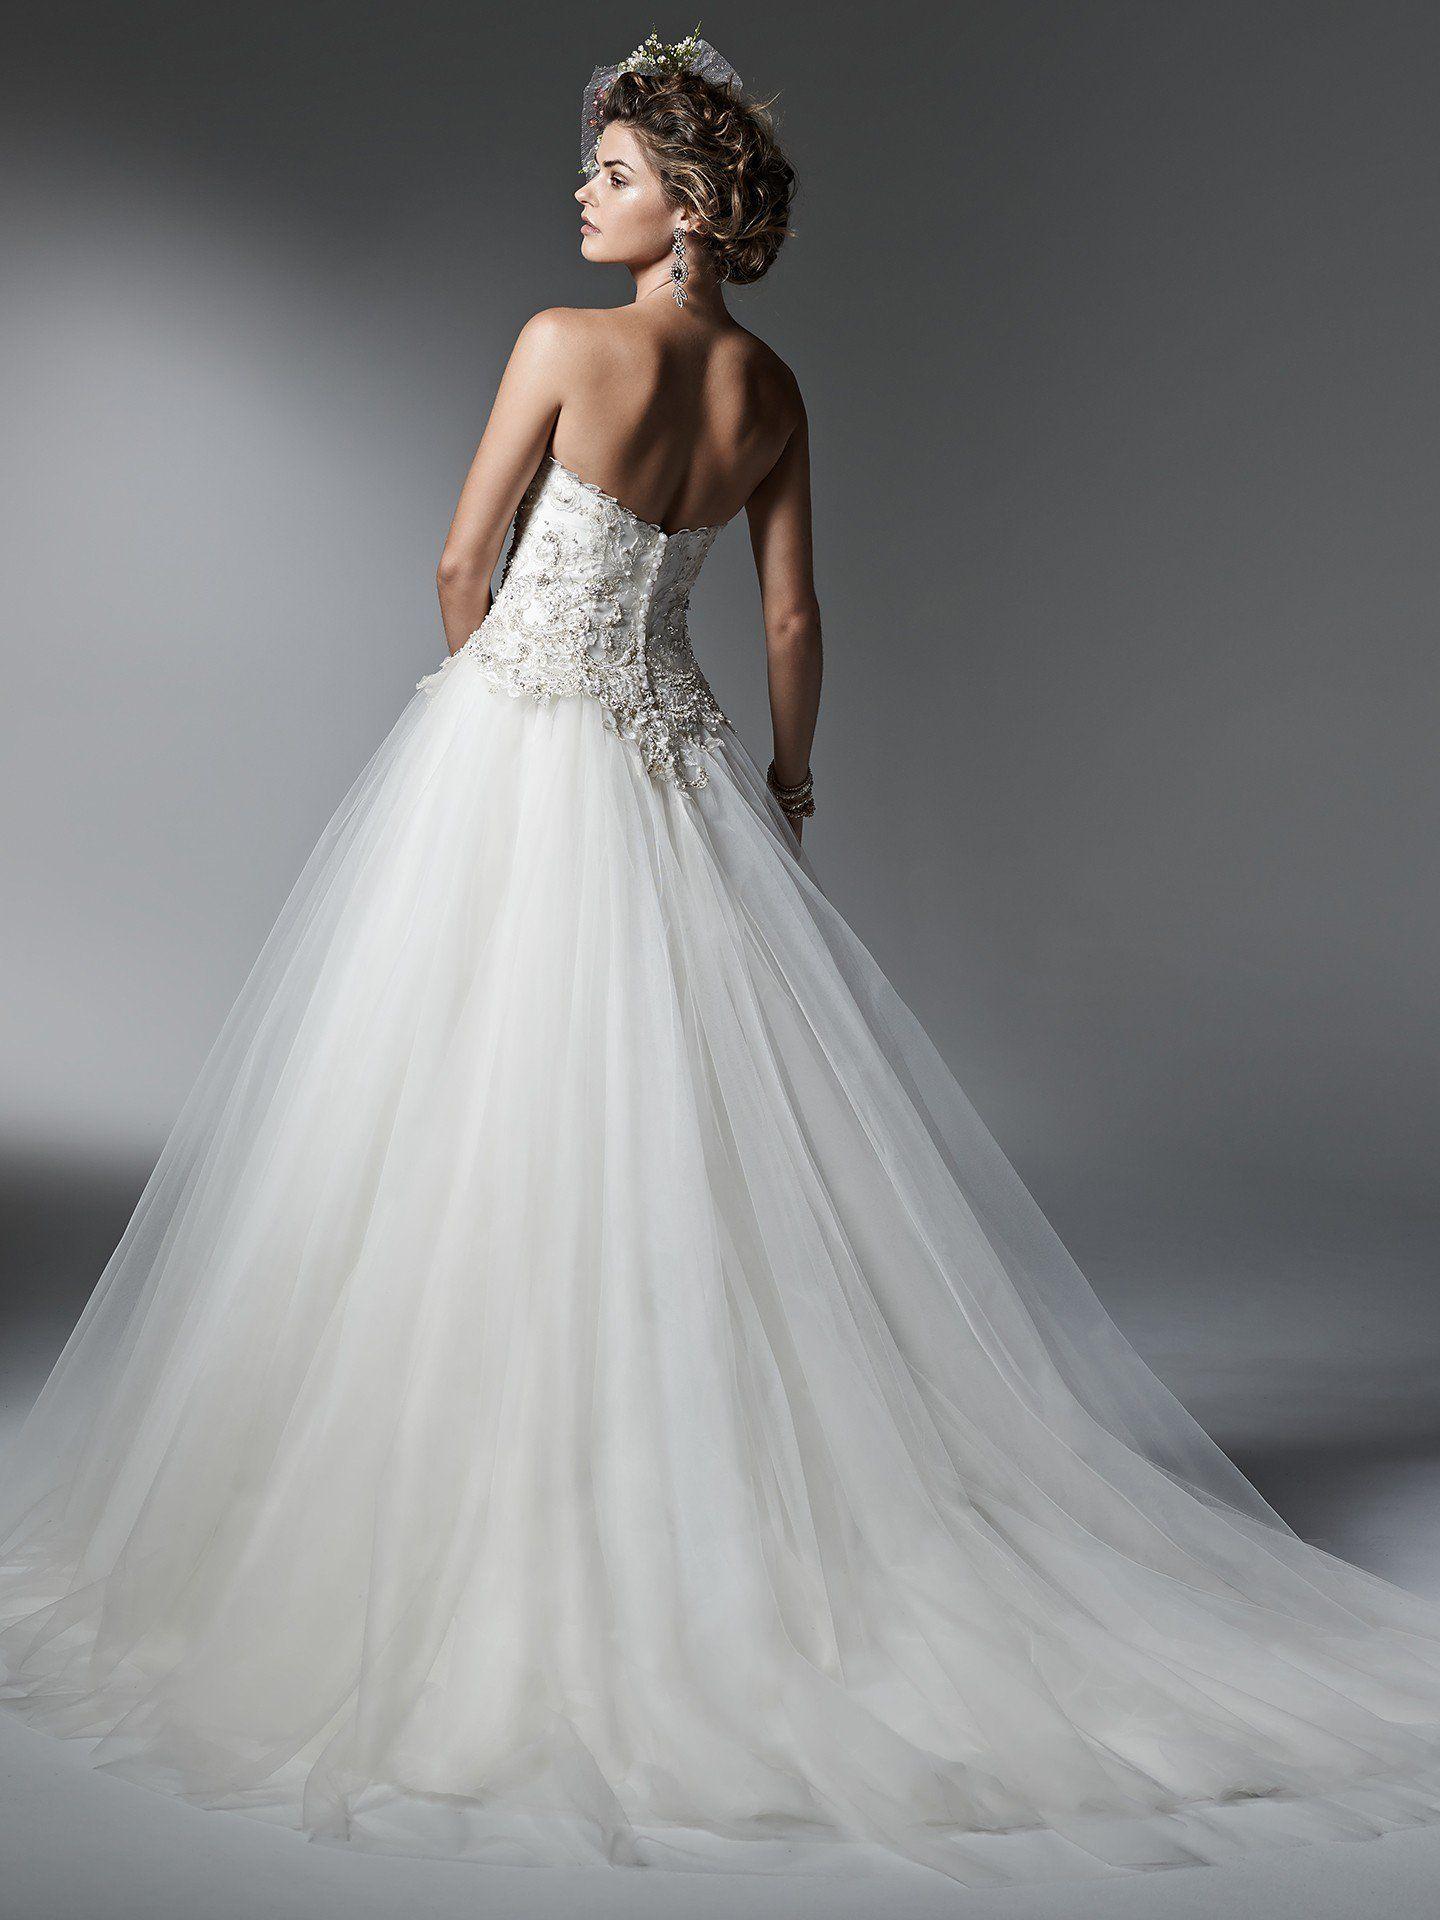 Sigourney by sottero midgley wedding dresses milton keynes sigourney by sottero midgley wedding dresses milton keynes ombrellifo Images